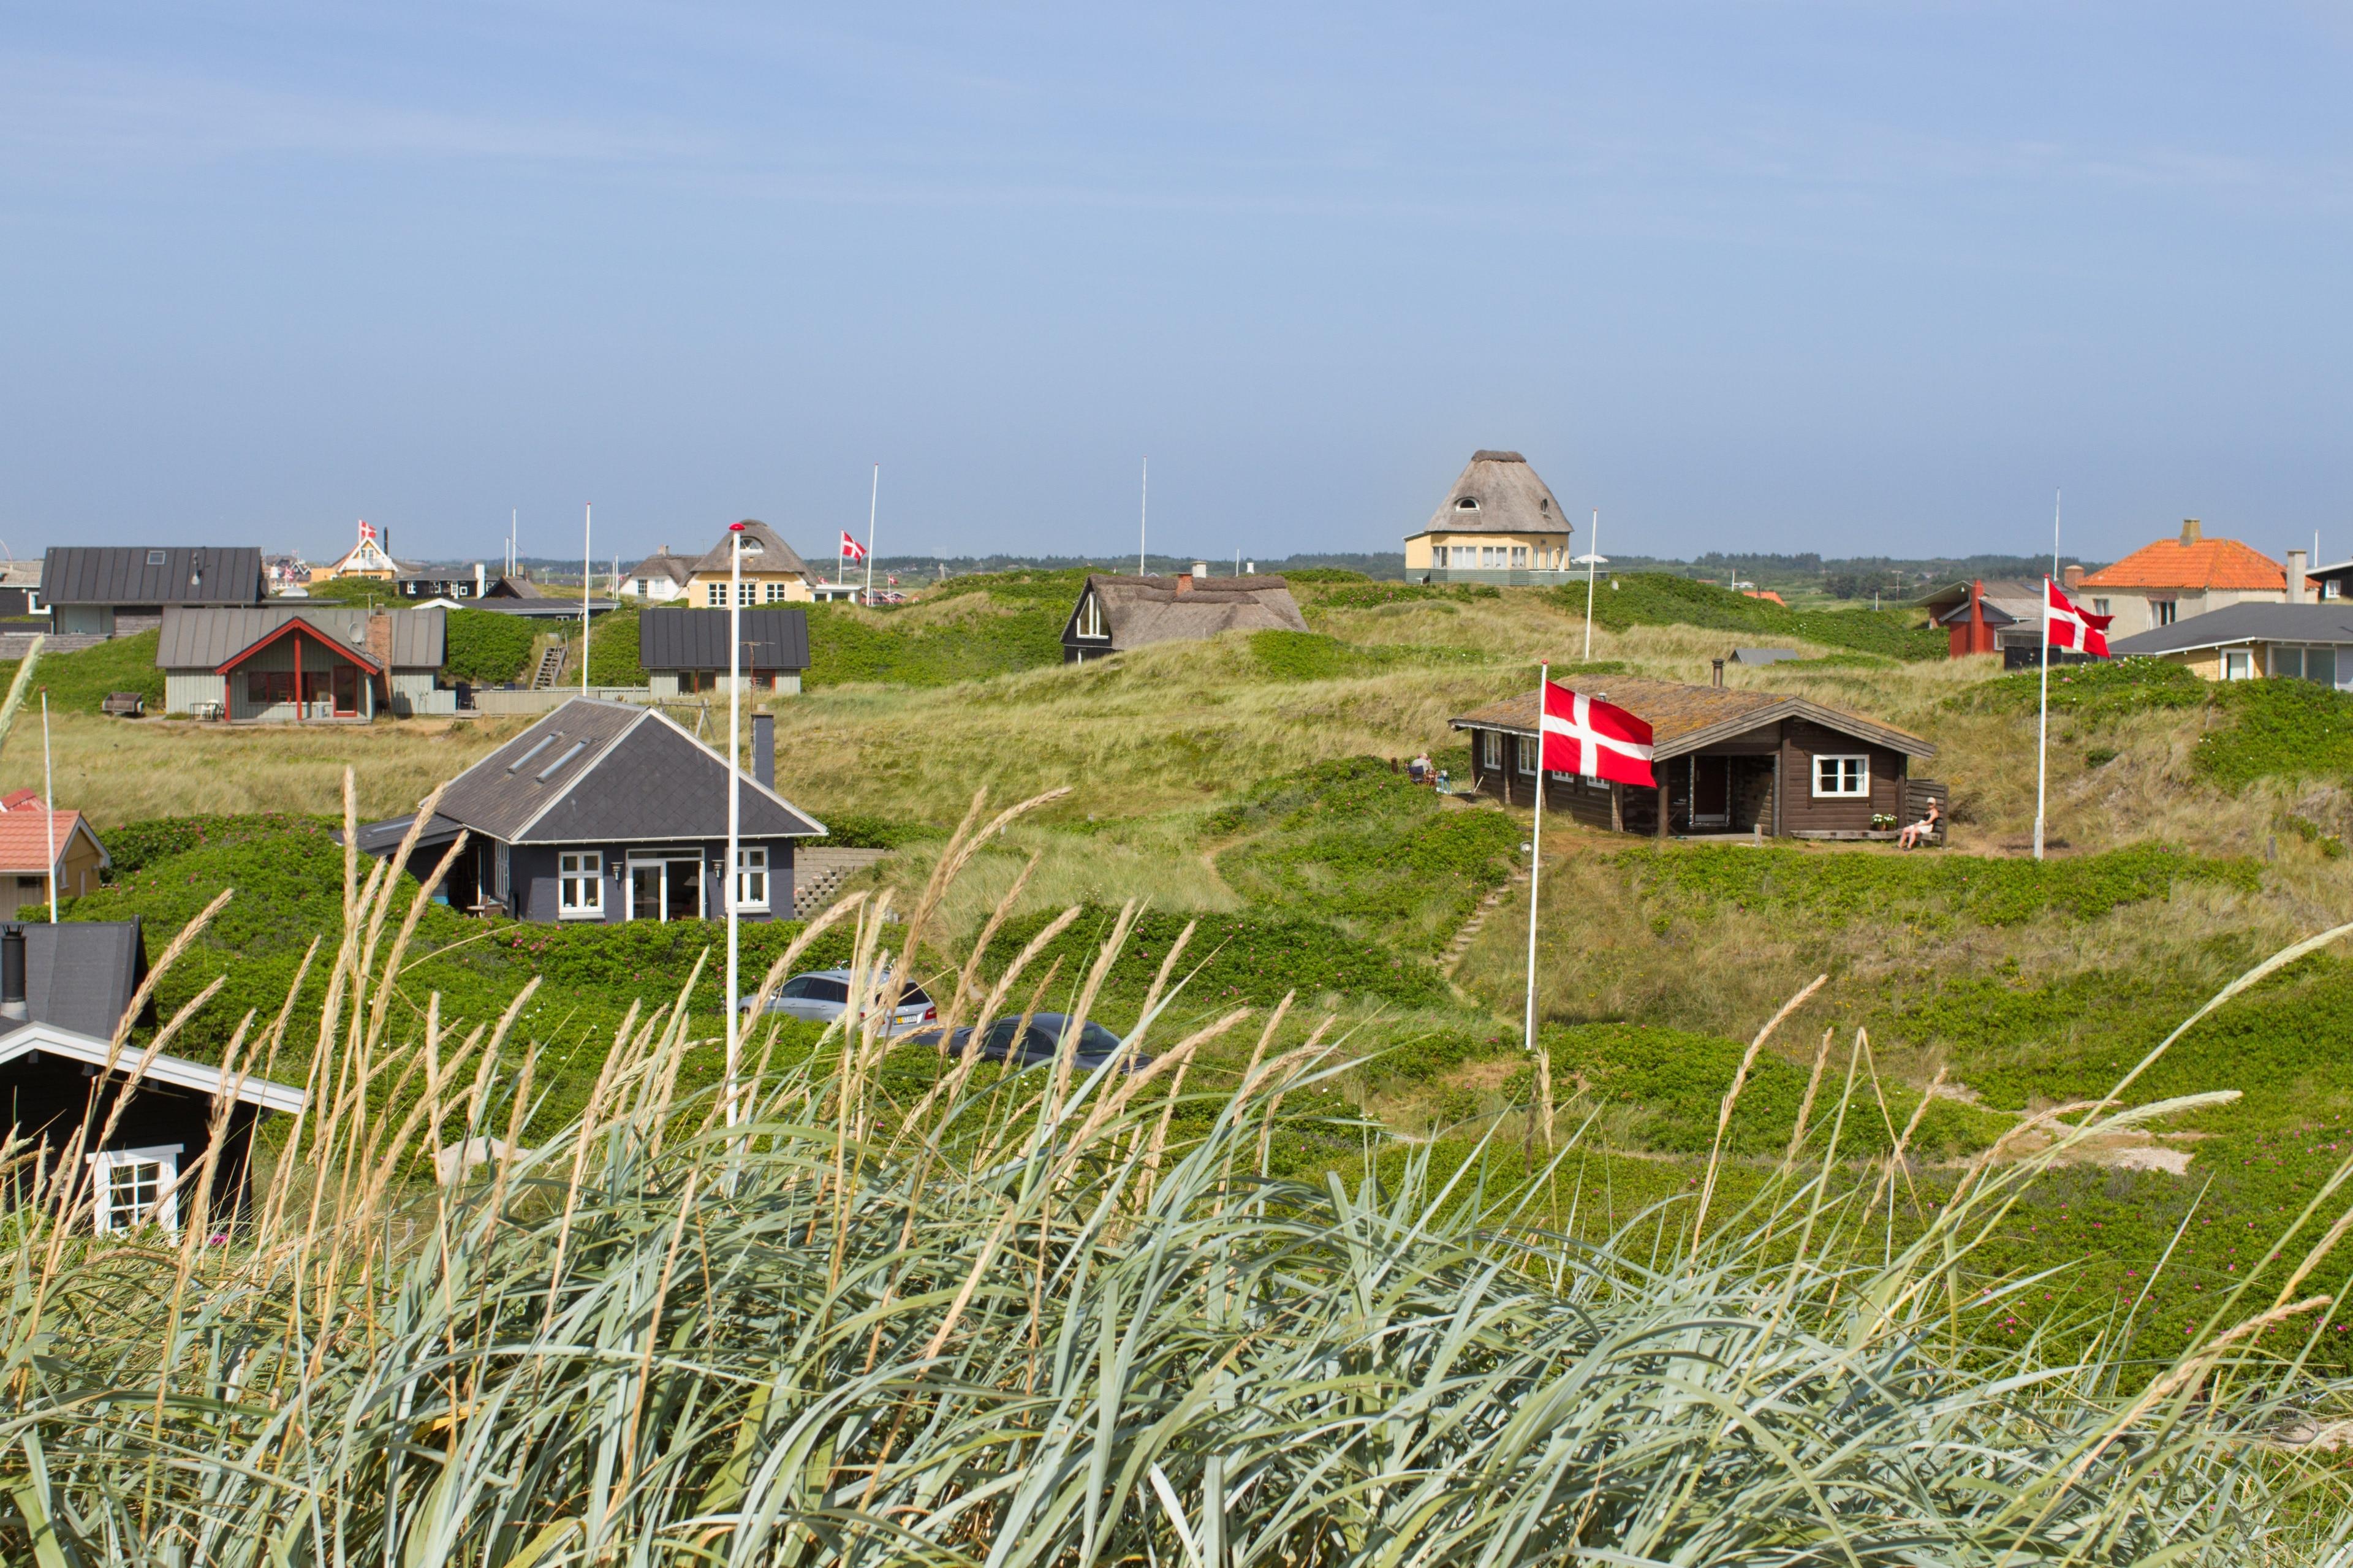 Ringkøbing-Skjern Kommune, Midtjylland (Region), Dänemark